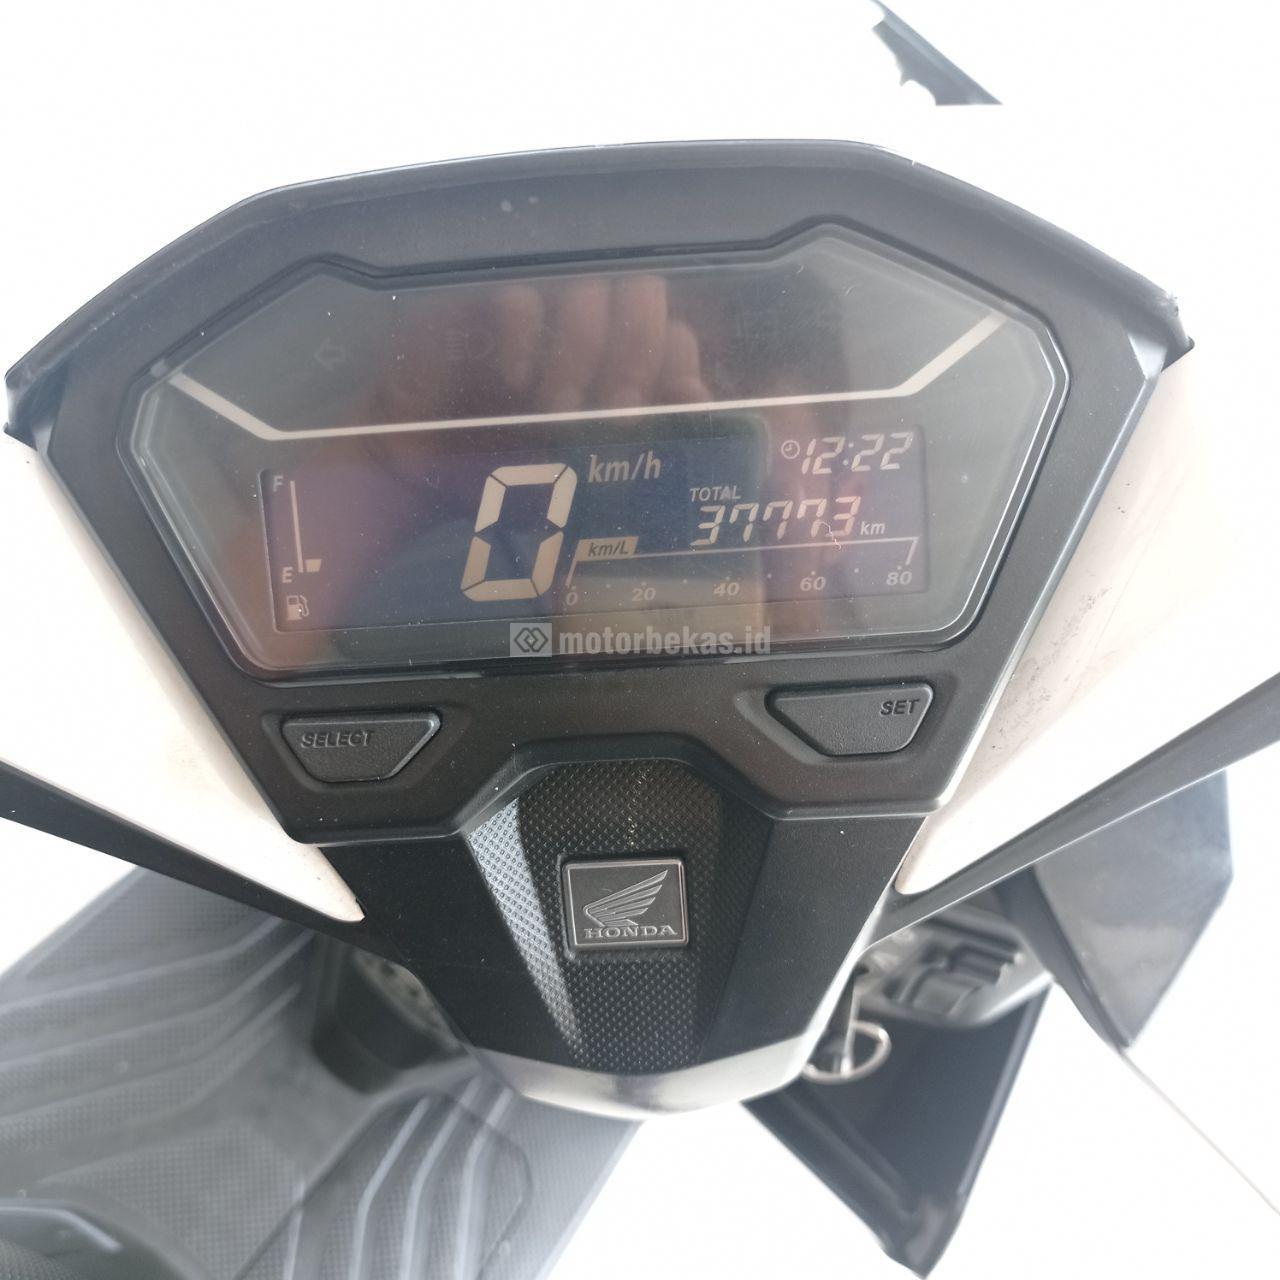 HONDA VARIO 125 ESP 2019 motorbekas.id